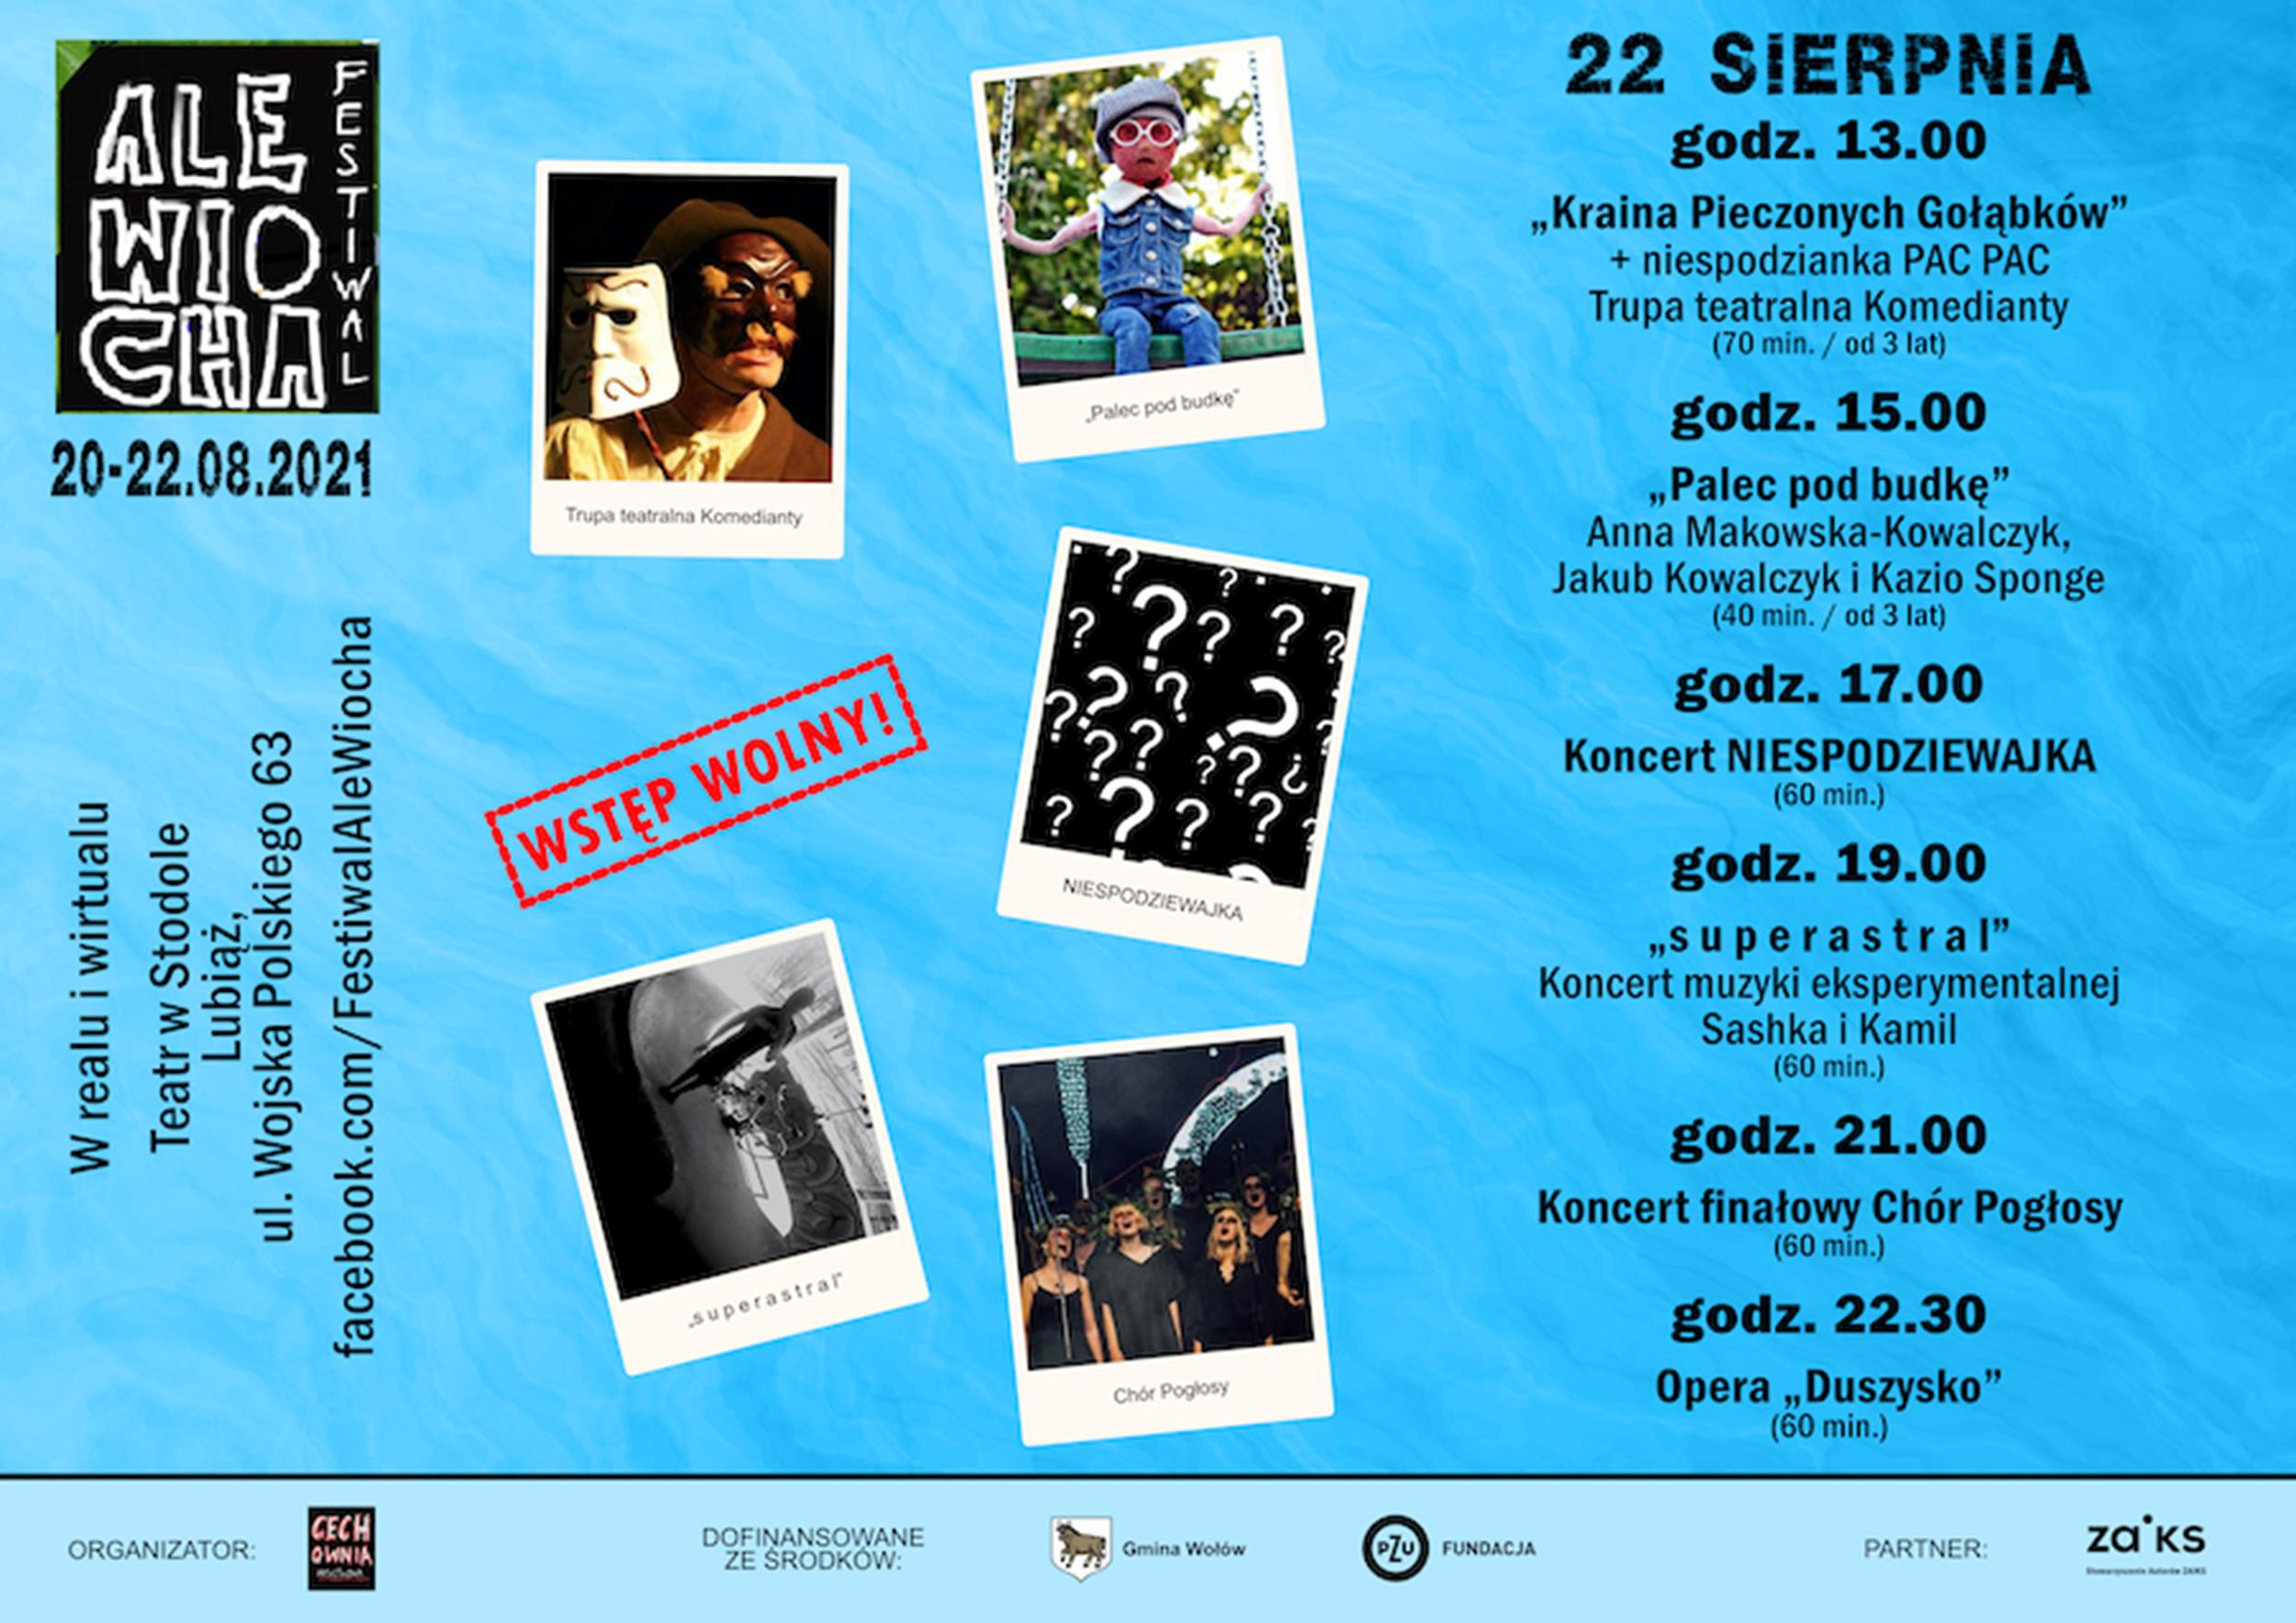 Festiwal Ale Wiocha 2021 Program (Dzień 3)